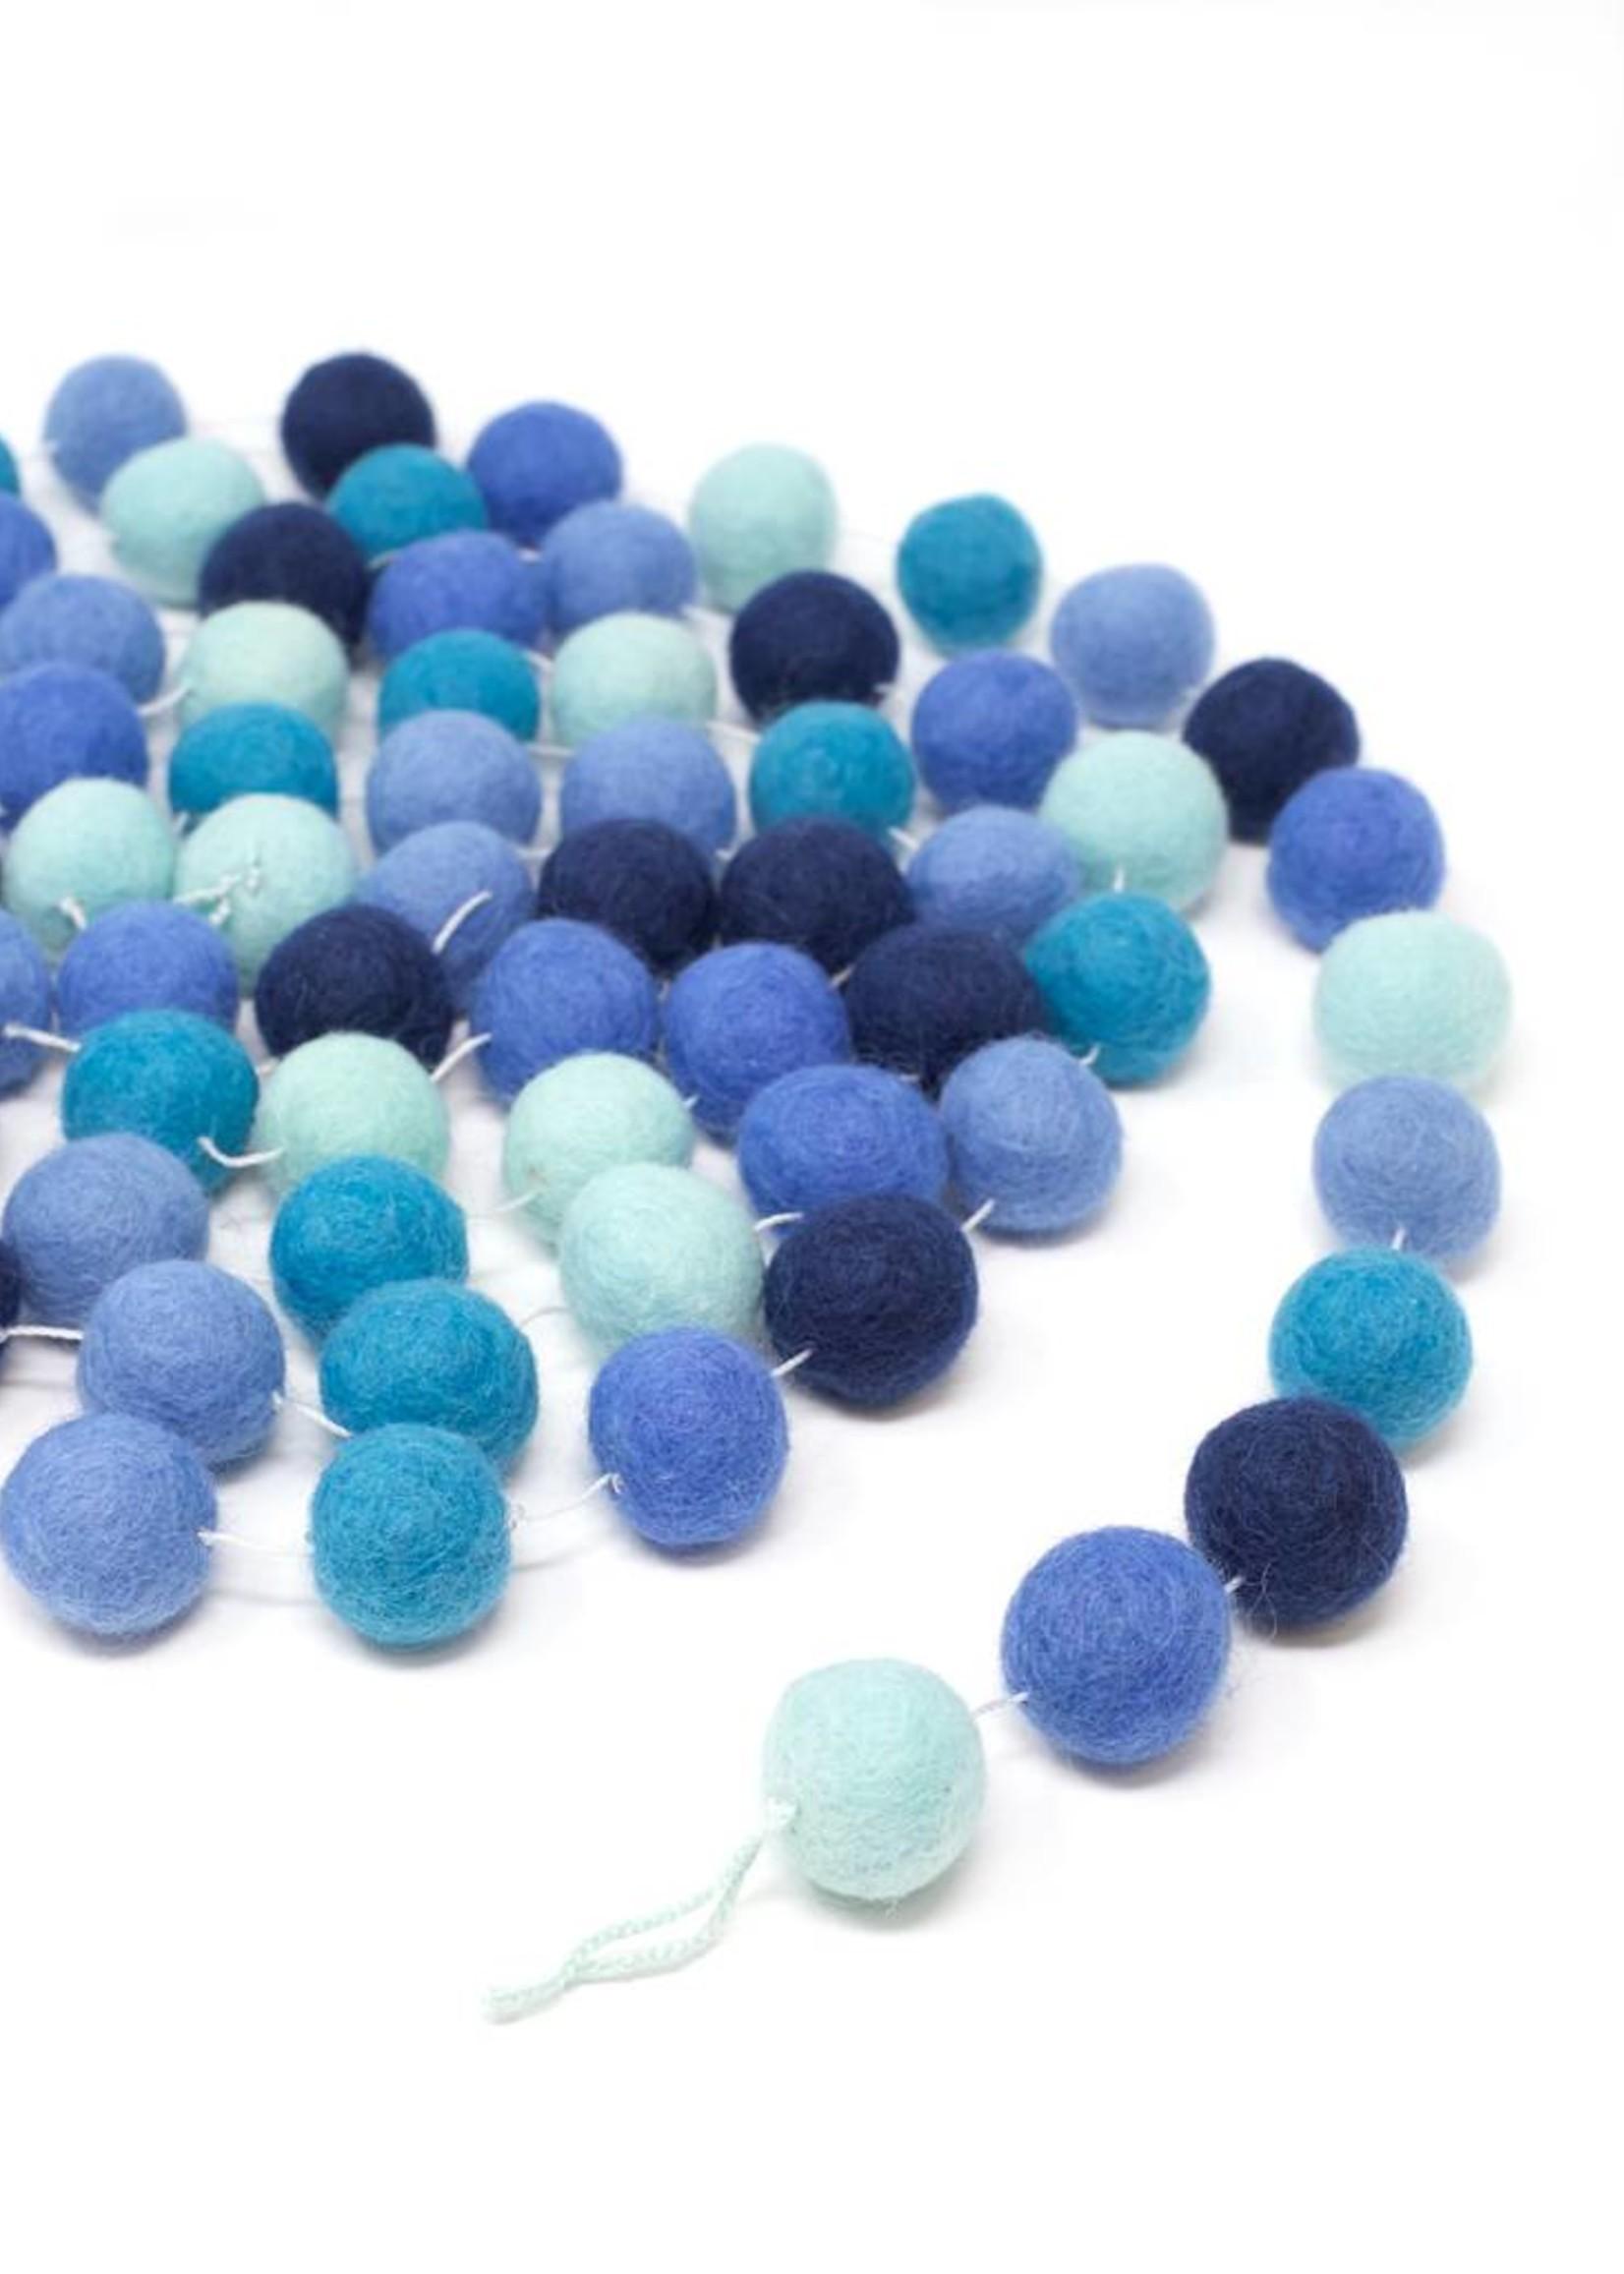 Ganesh Himal Blue Felt Ball Garland